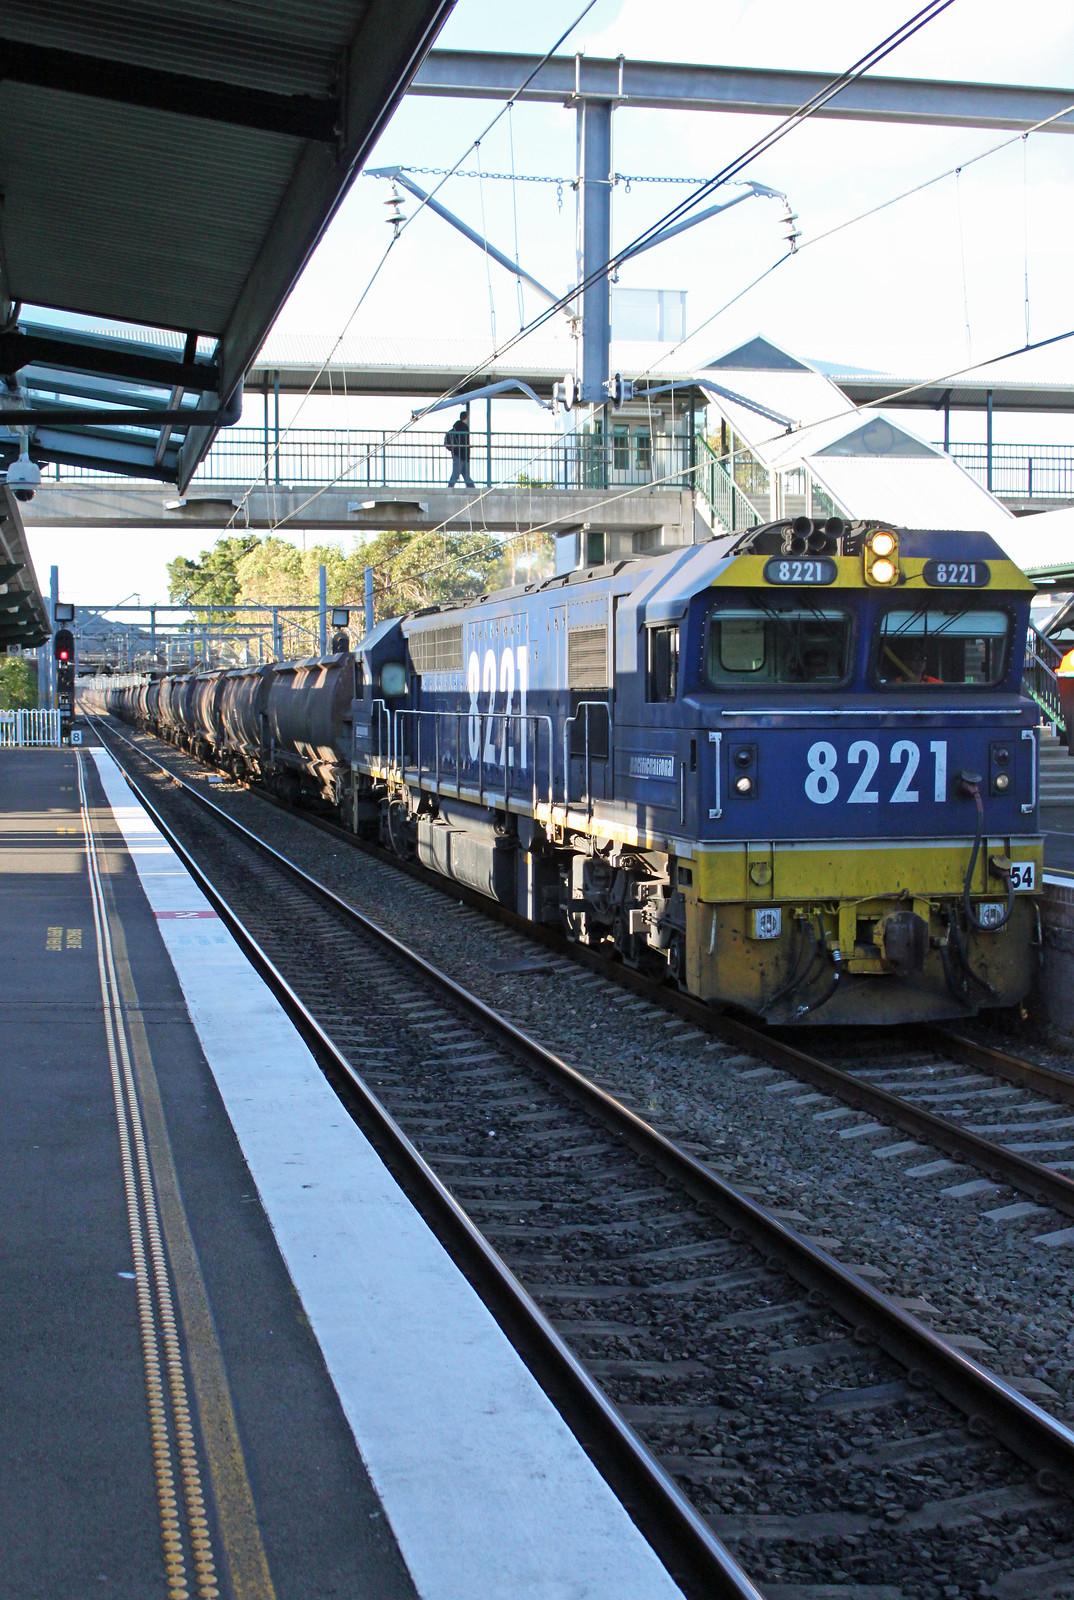 8221, 8209 (rear) MC86 Thirroul by Thomas